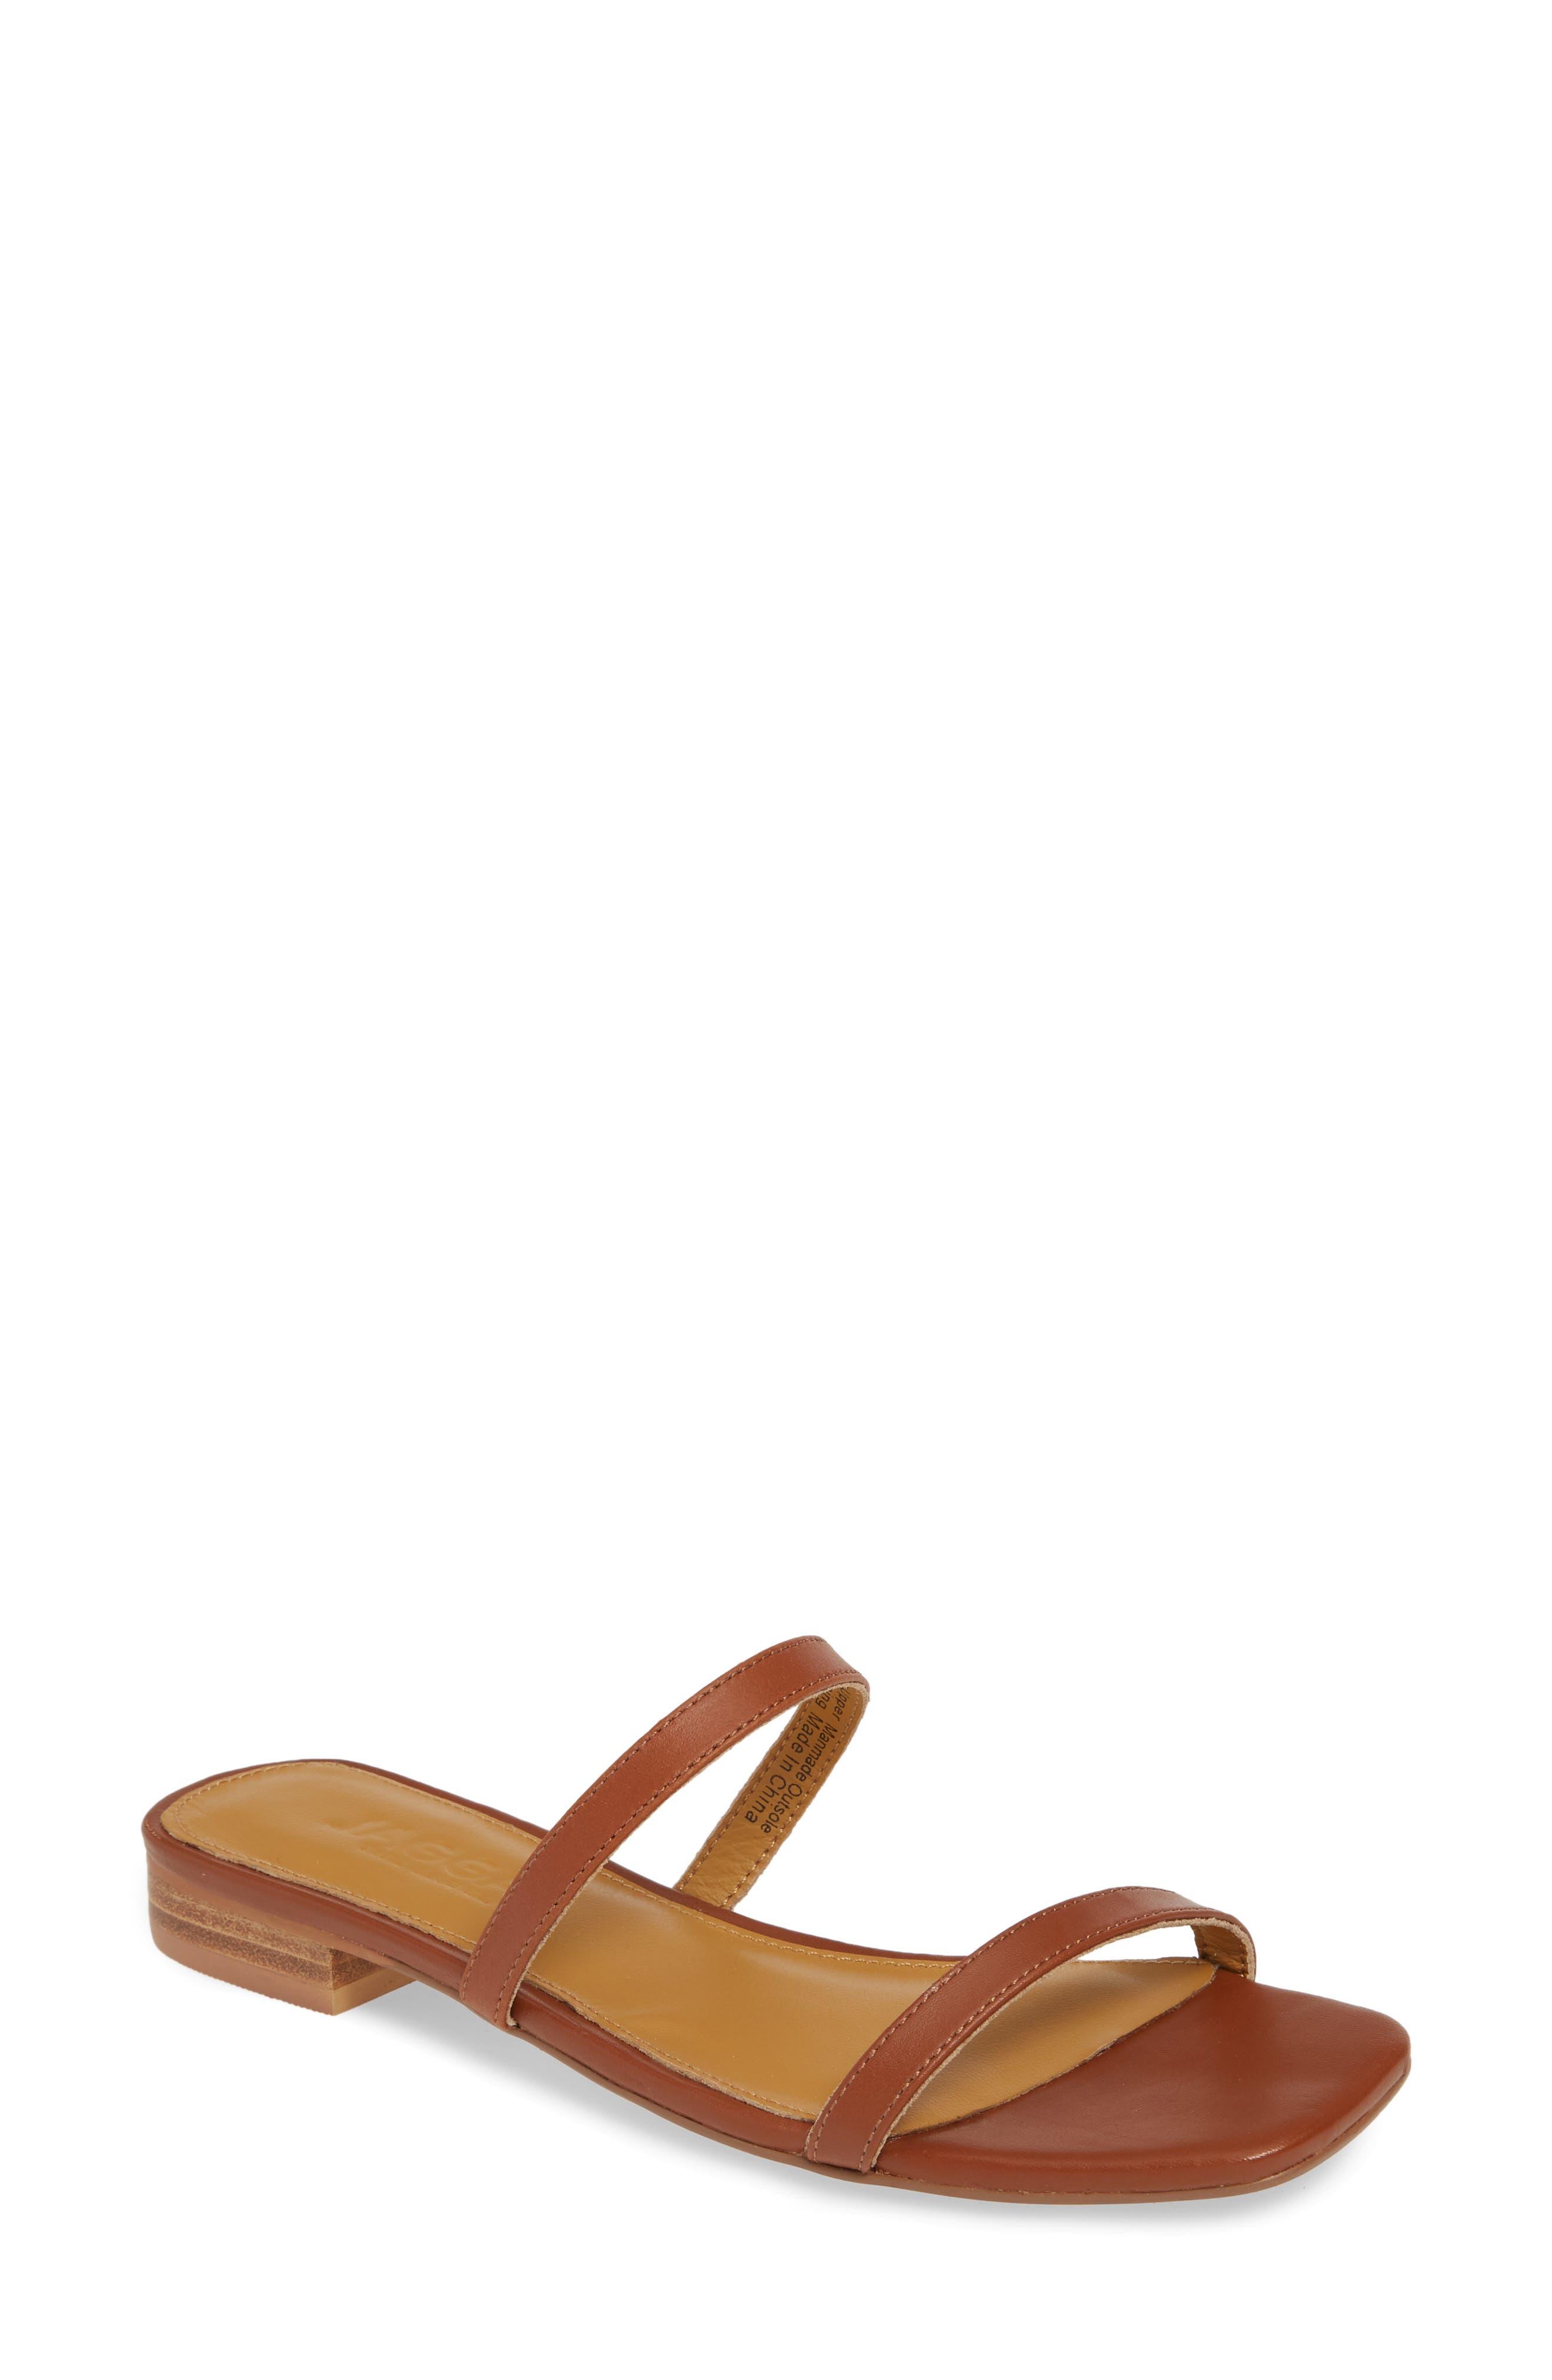 JAGGAR Sprung Slide Sandal, Main, color, RUST LEATHER